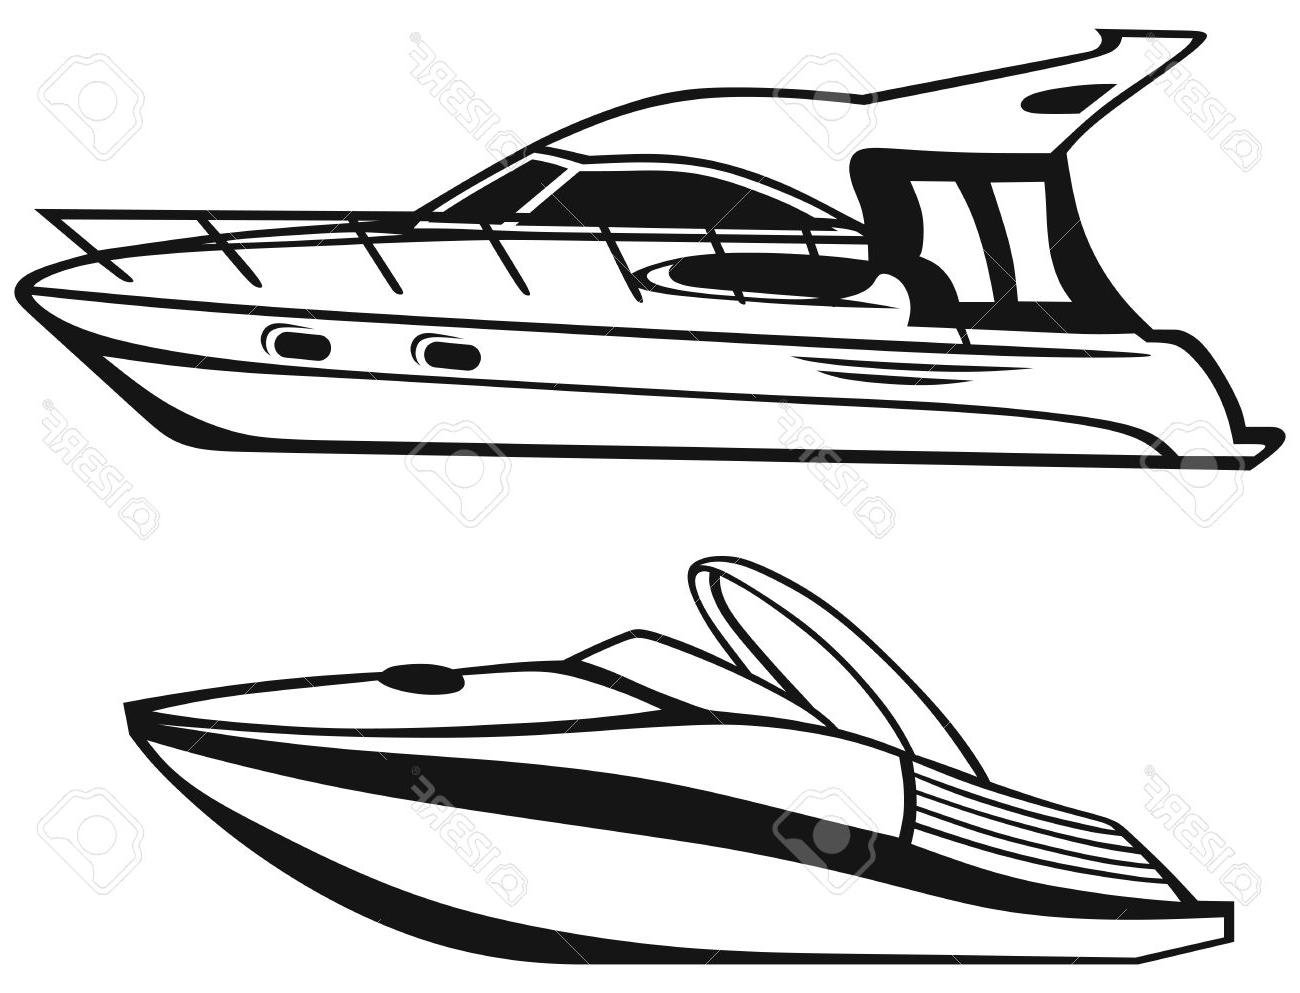 Boat Silhouette Vector At Getdrawings